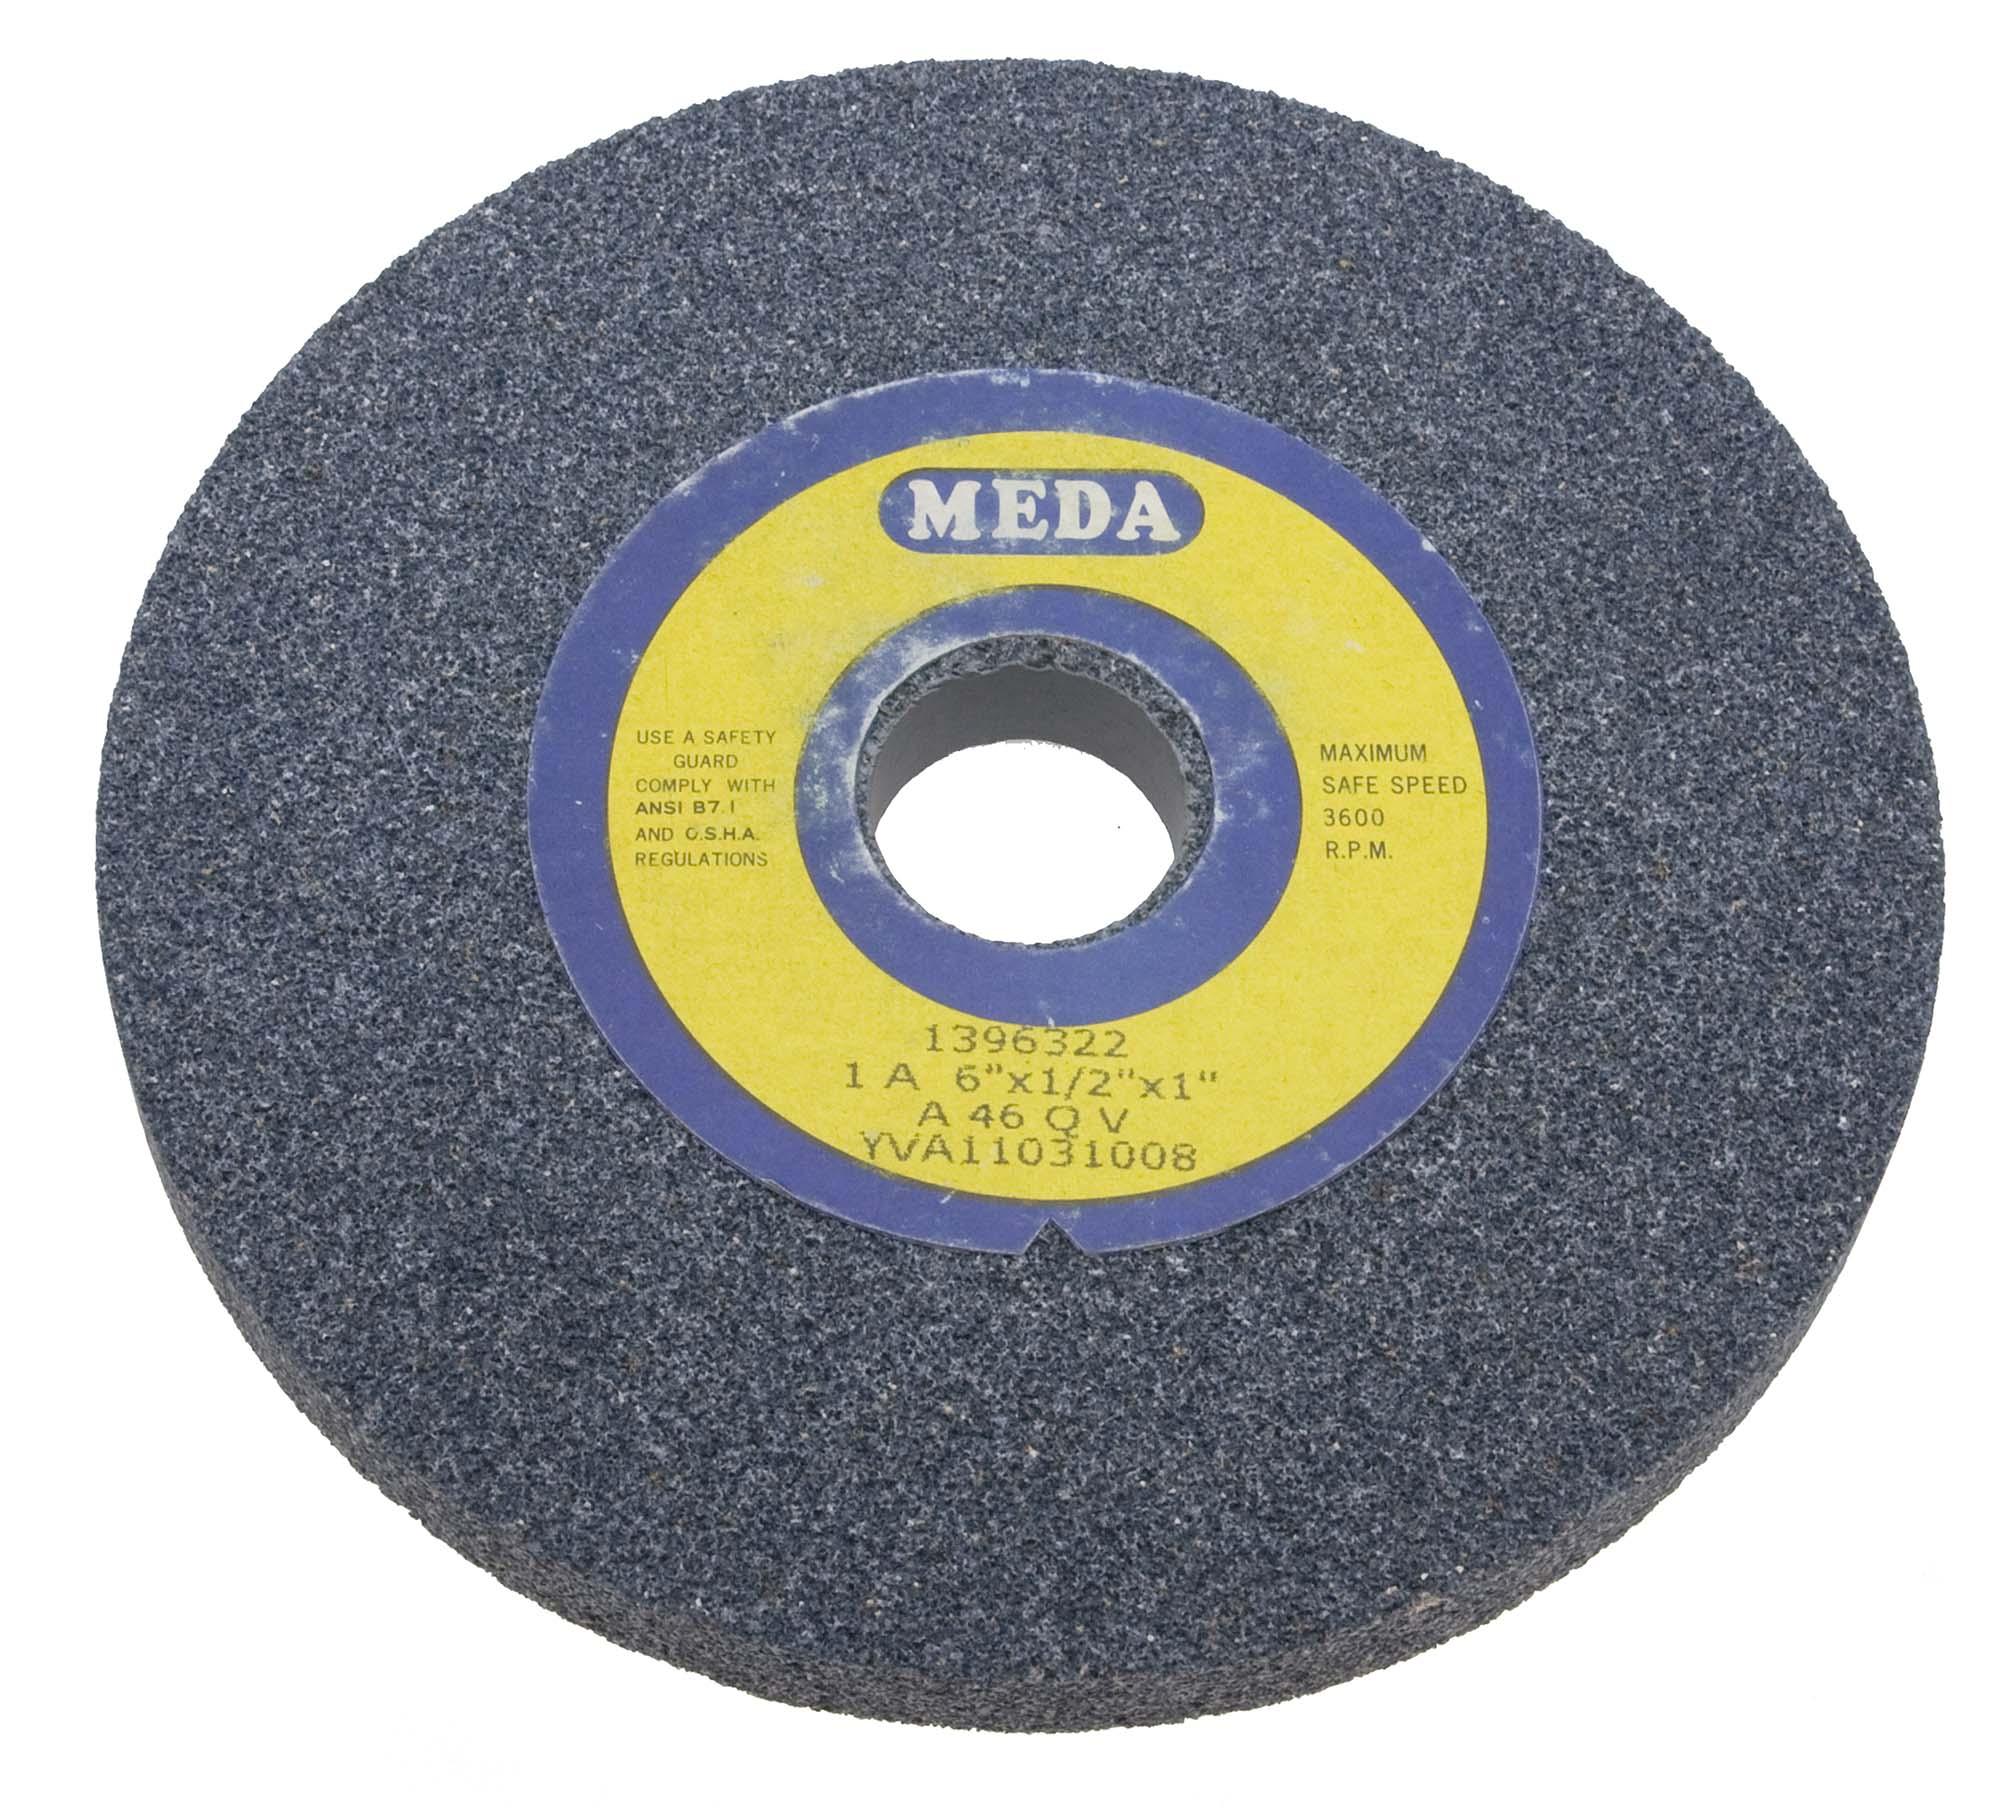 Meda 7 X 1 X 1 Fine 80 Grit Grey Bench Grinding Wheel